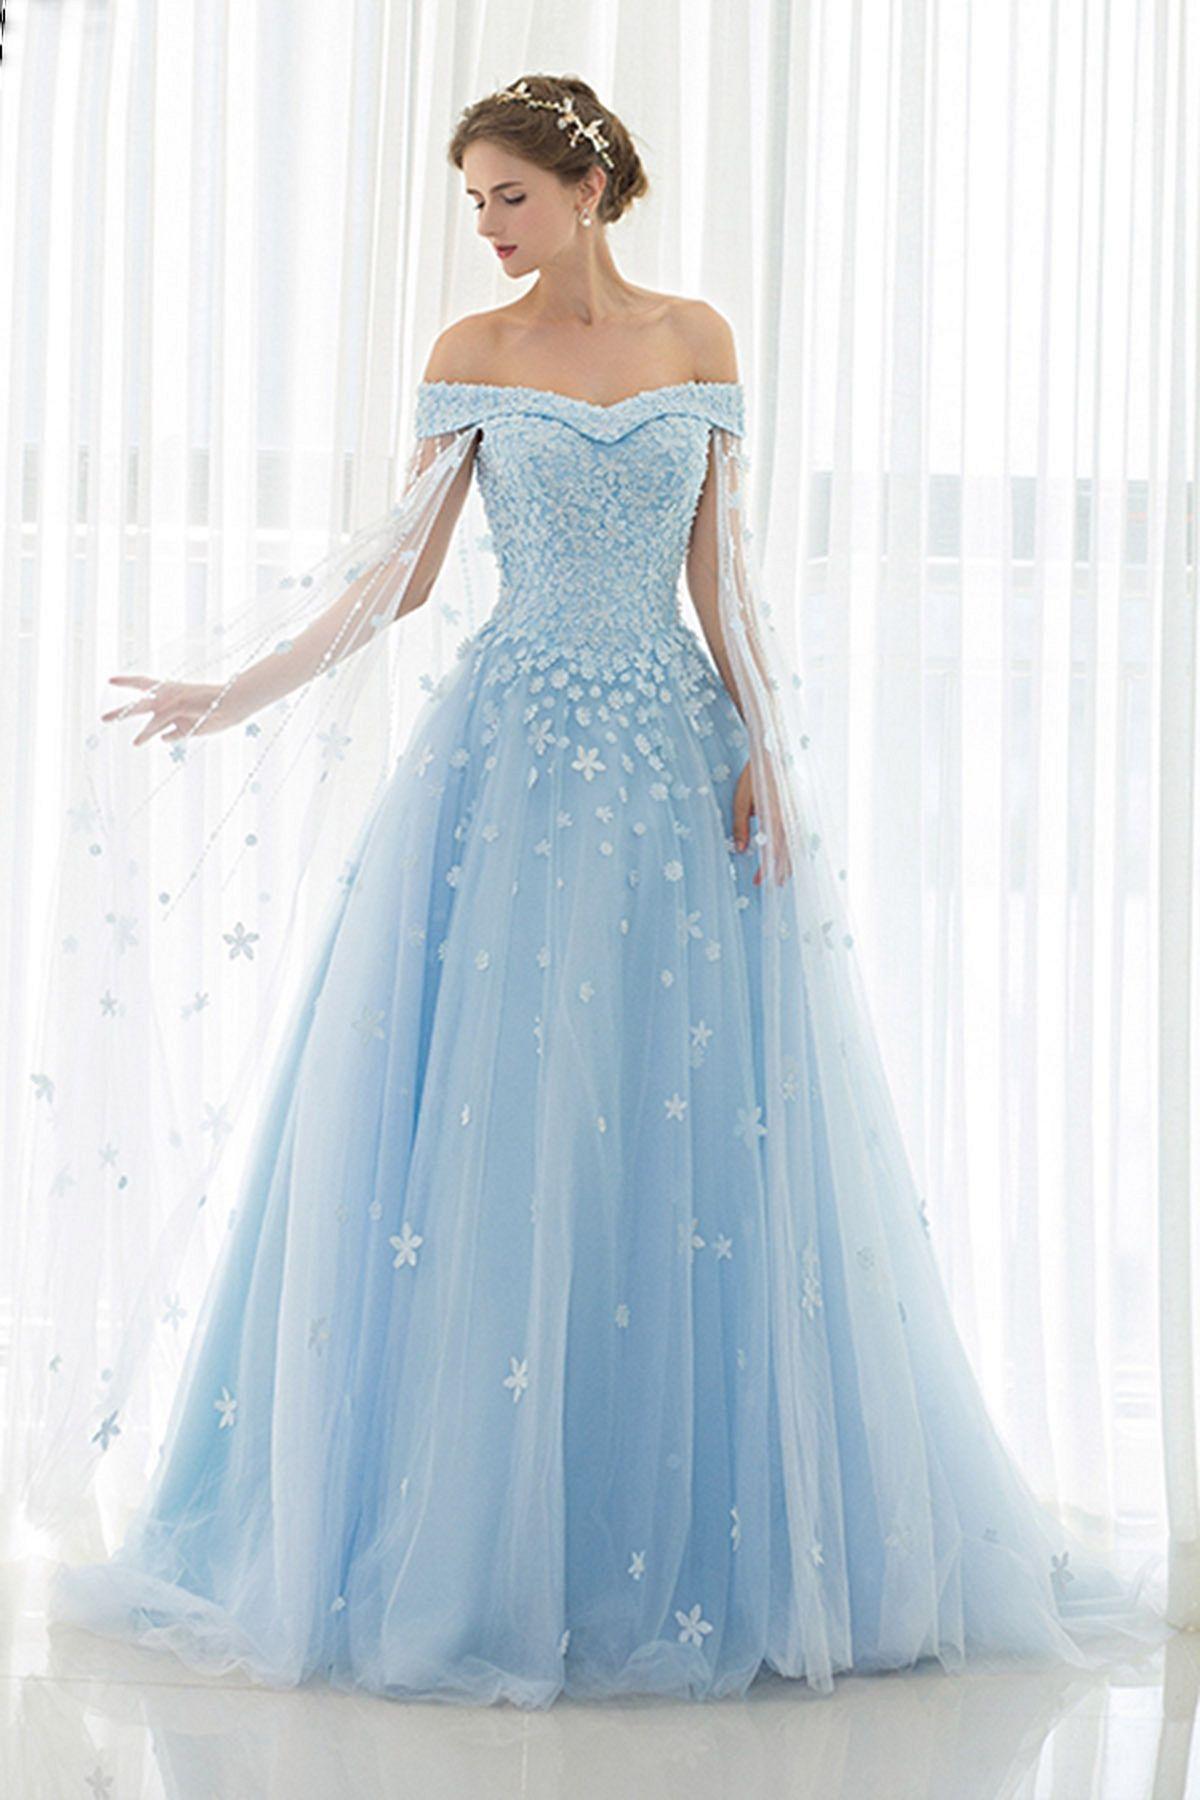 Enchanting Prom Dresses Baton Rouge Photo - All Wedding Dresses ...